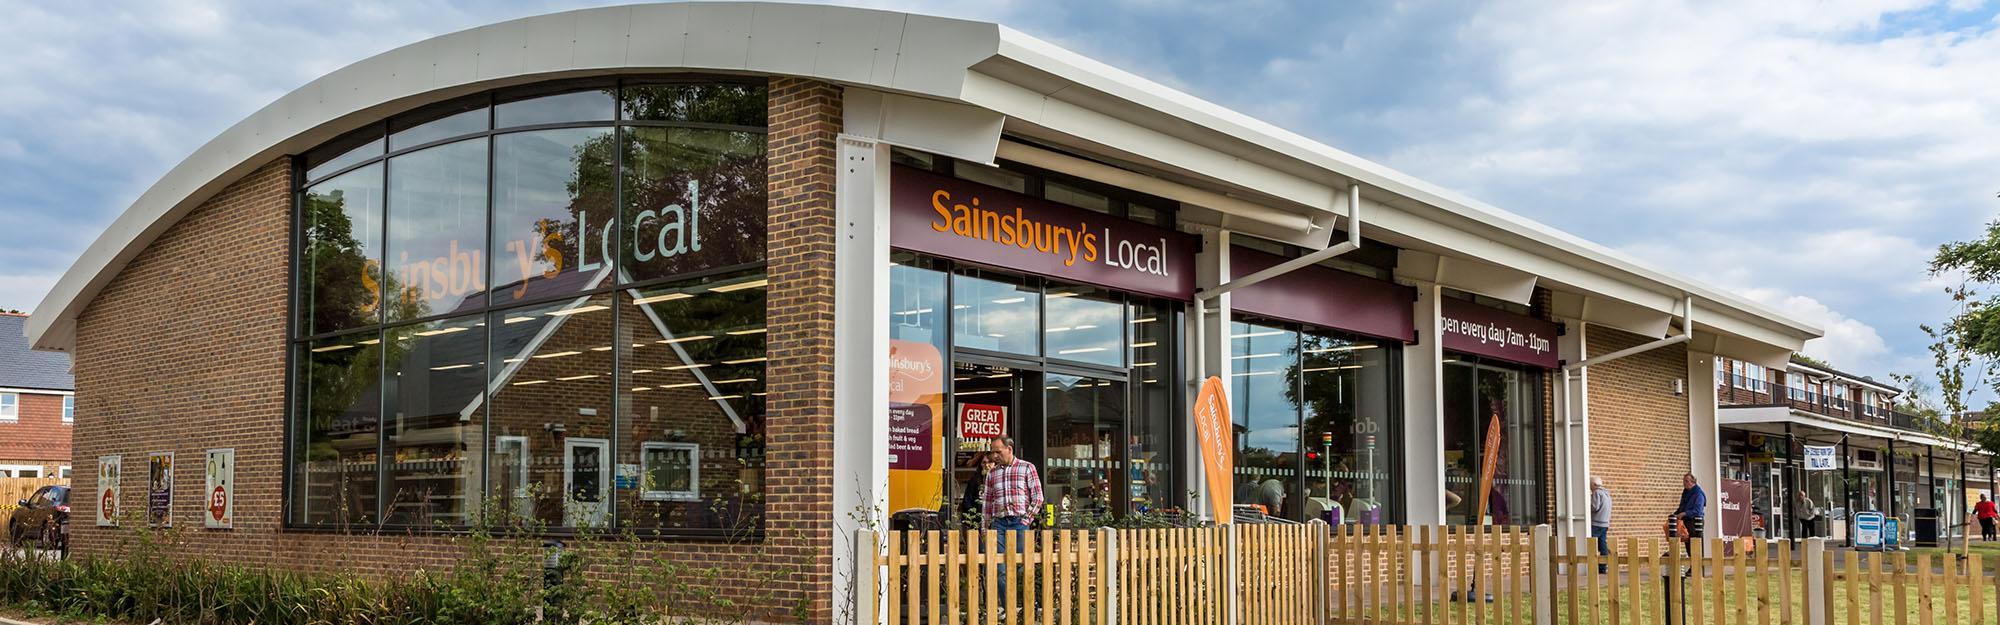 Sainsbury Loose Road